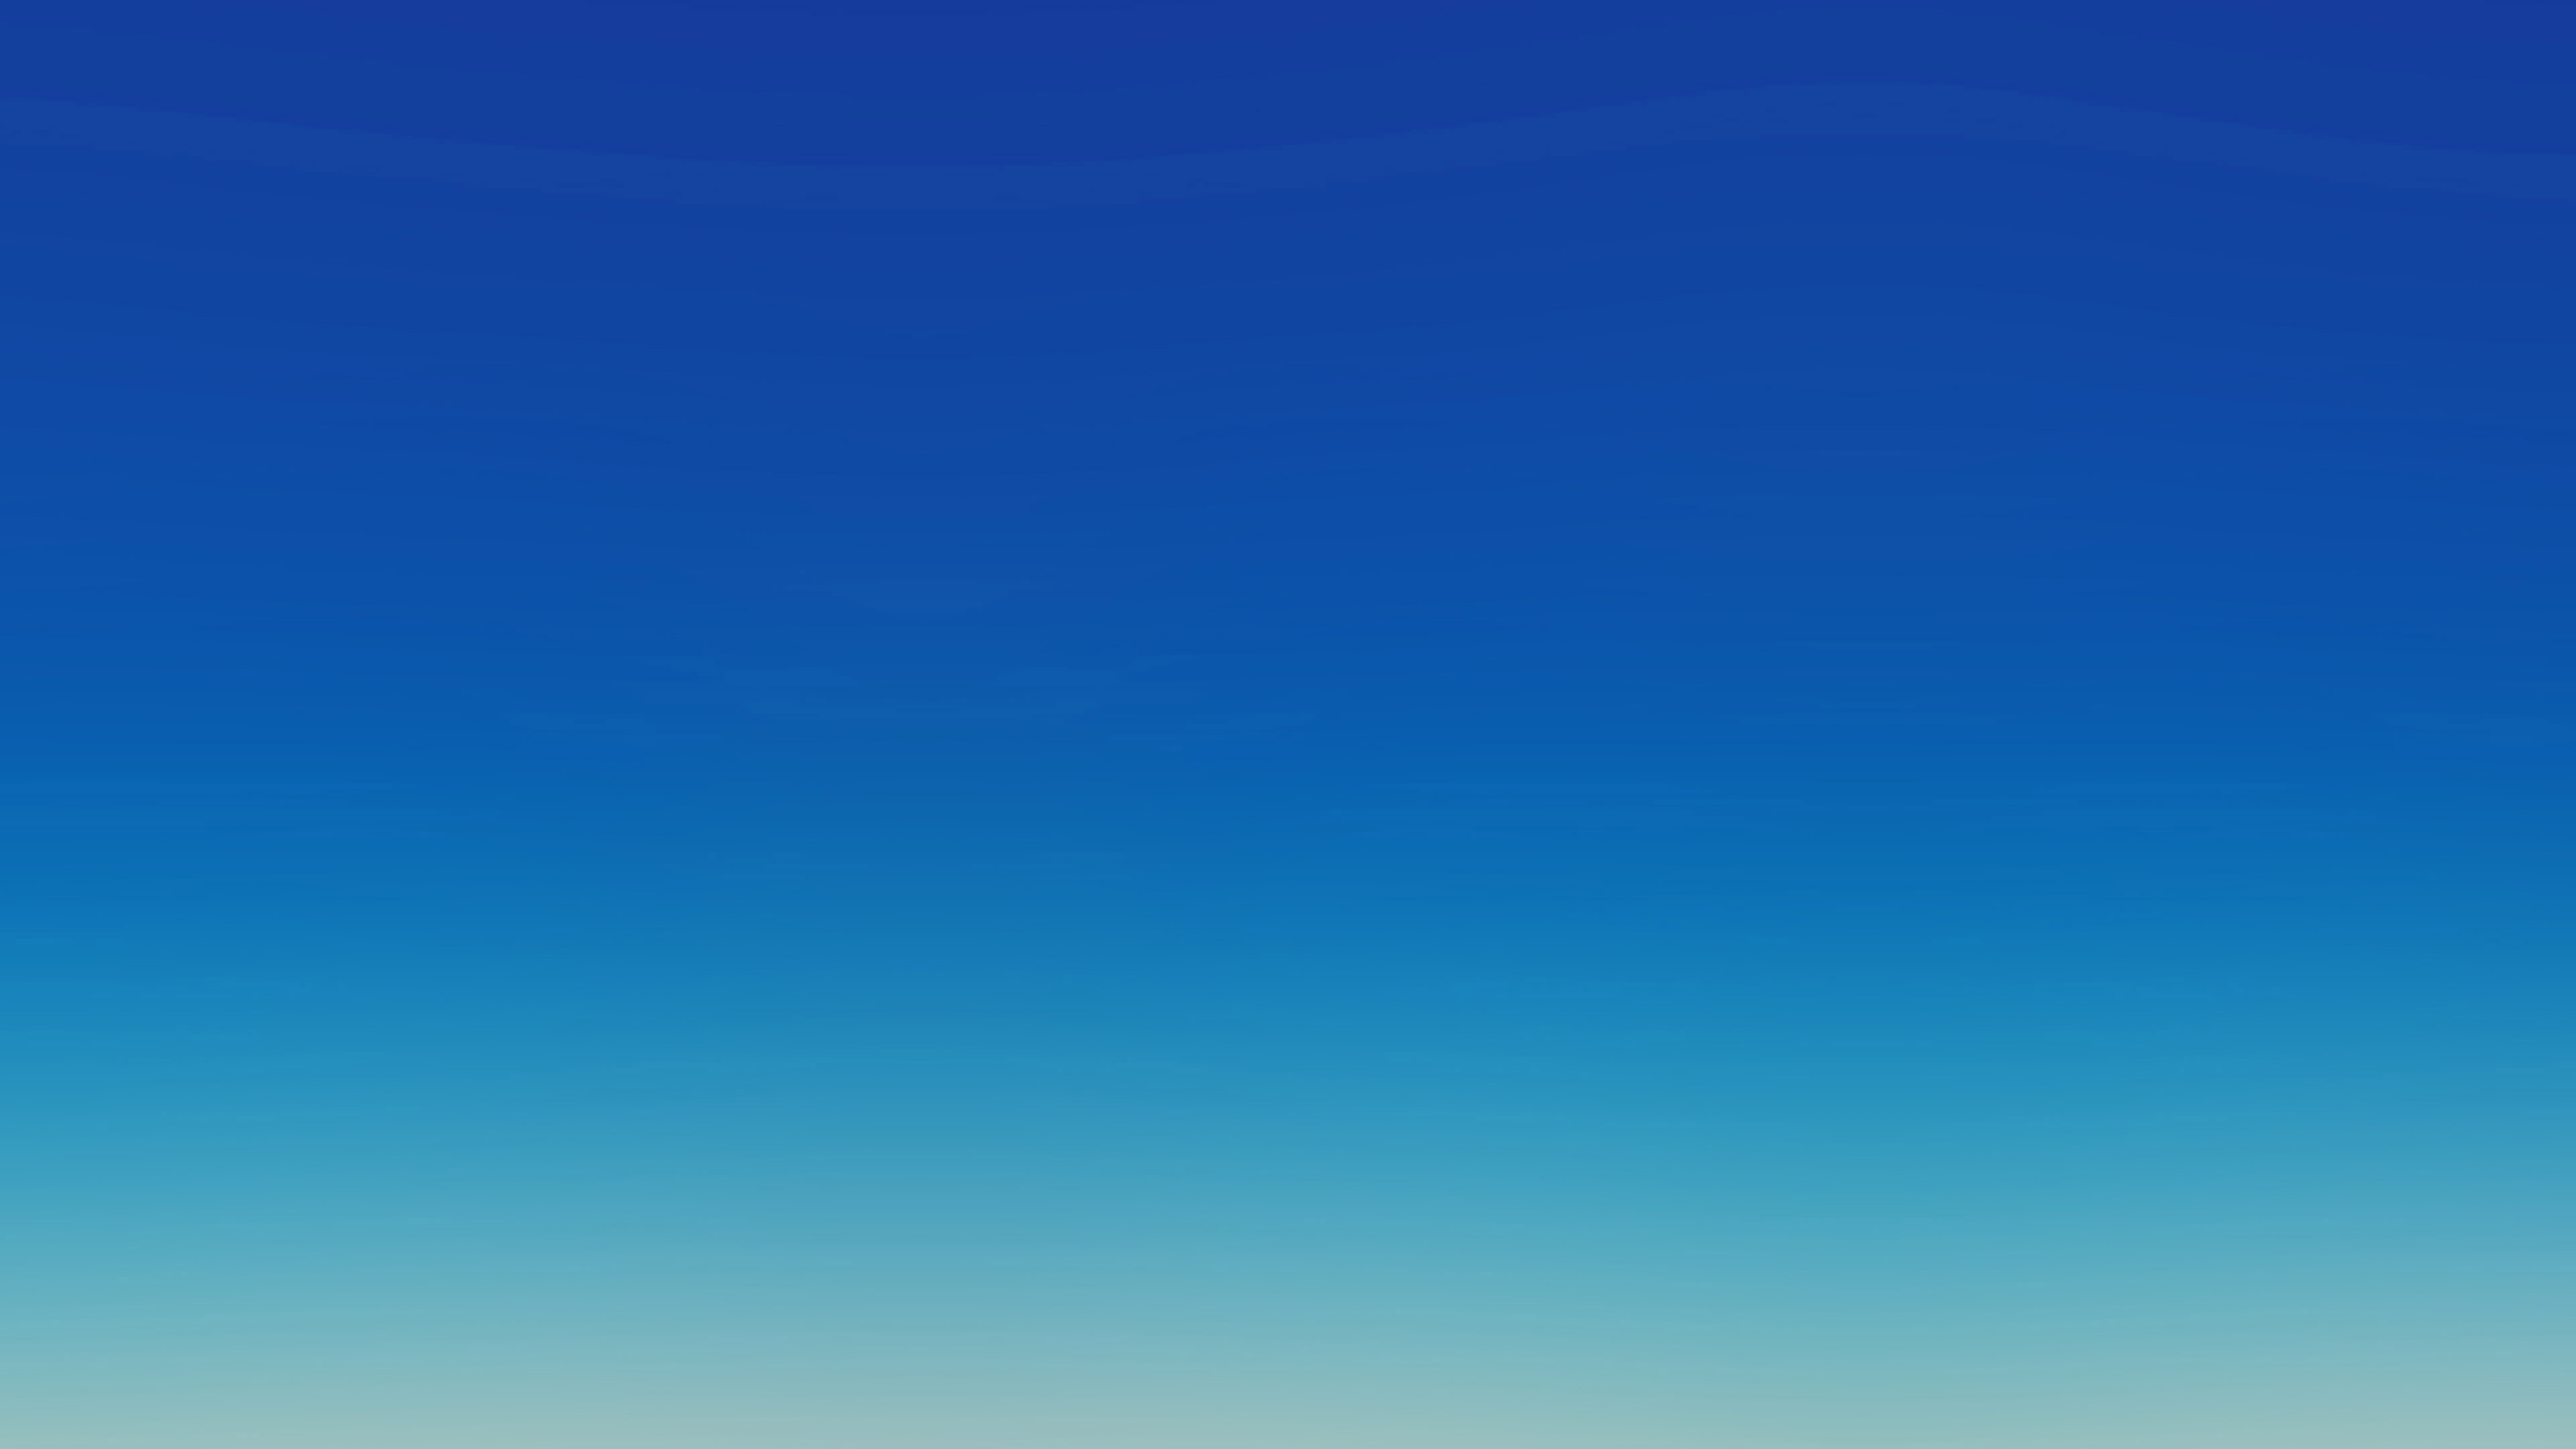 Snow Anime Wallpaper Wallpaper For Desktop Laptop Sa08 Blue Sky Blue Blur